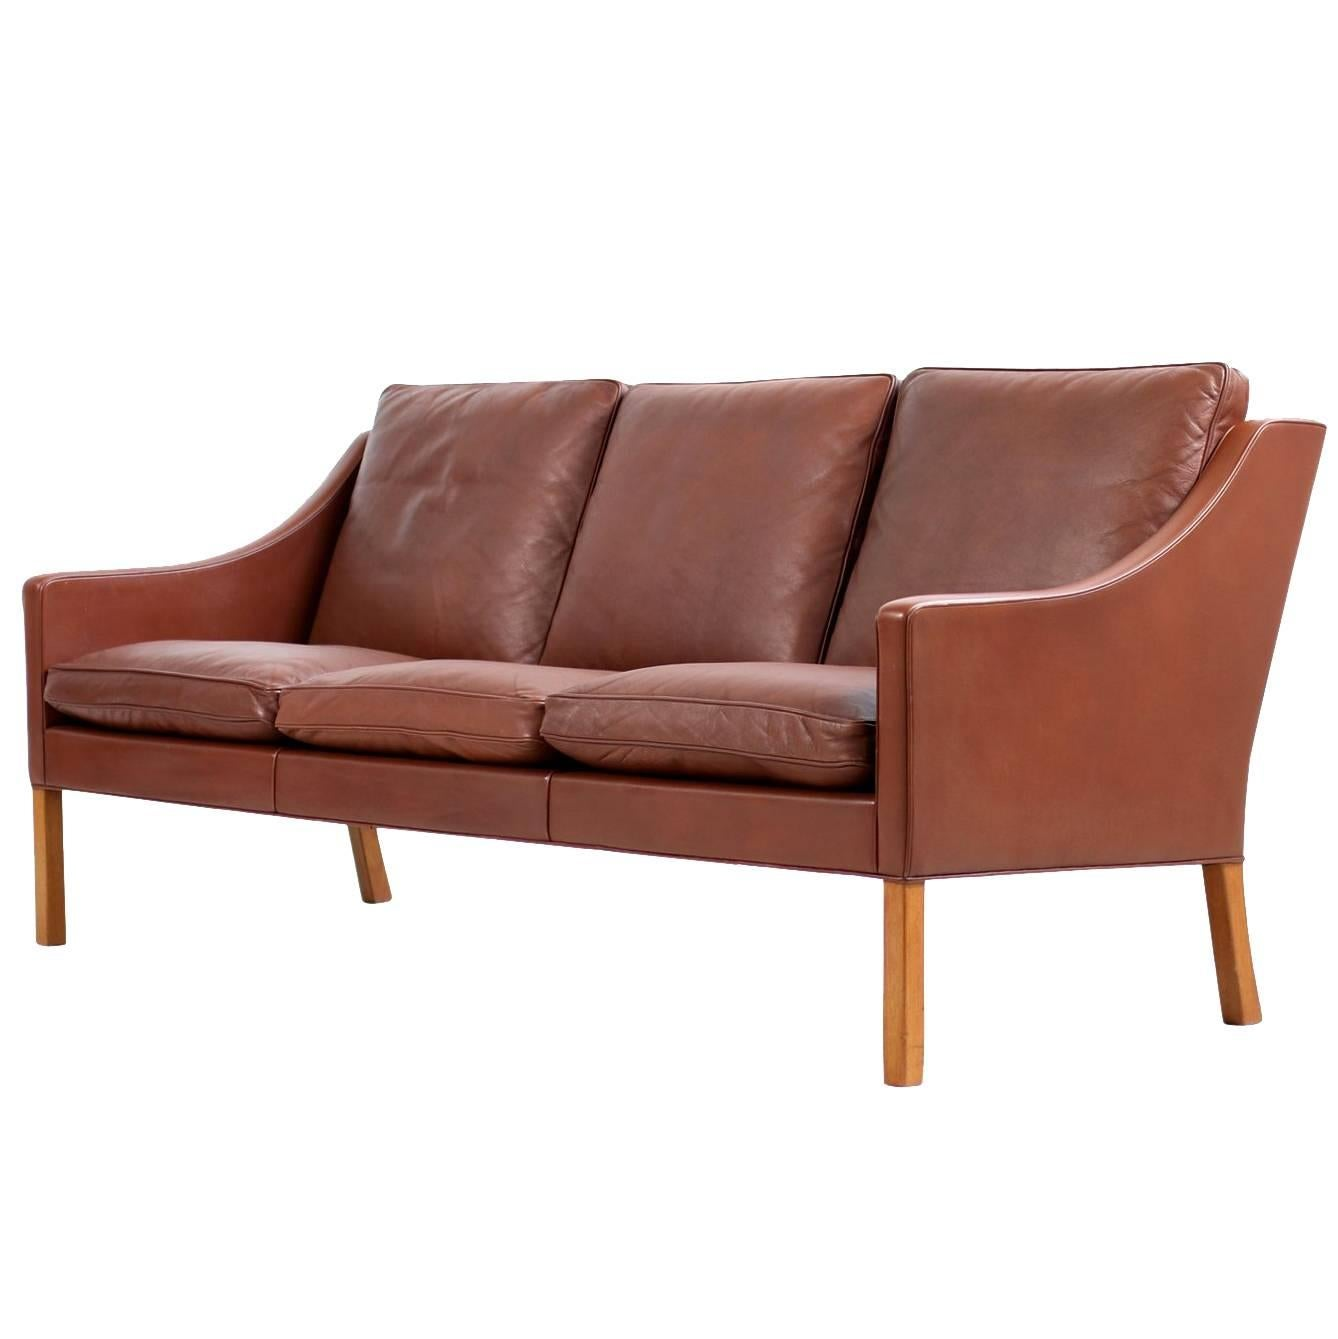 beautiful 1960s borge mogensen mod leather lounge sofa fredericia denmark